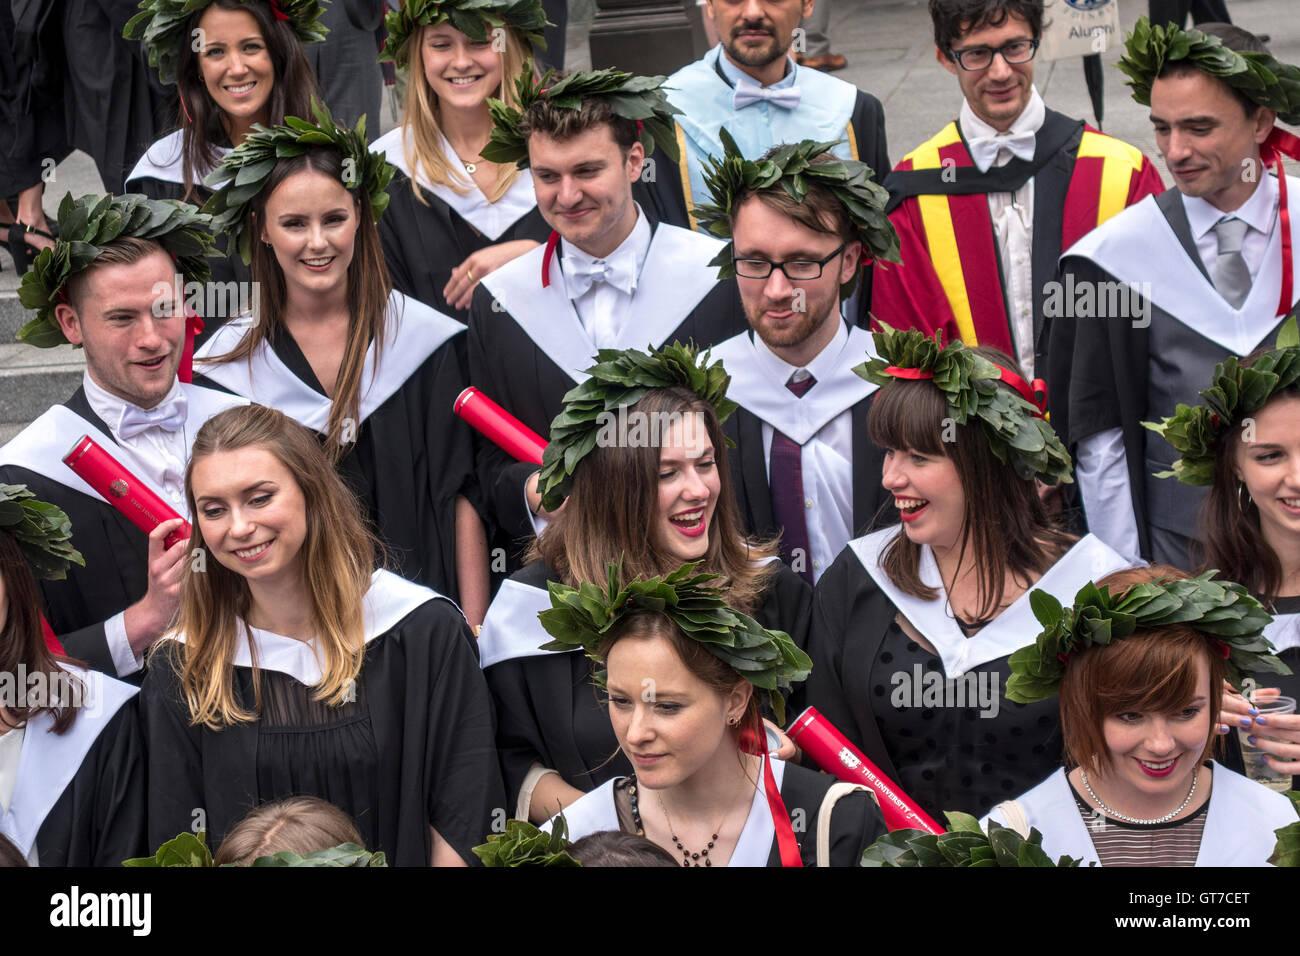 Edinburgh University Graduation day. Happy graduating students wearing laurel wreaths. - Stock Image